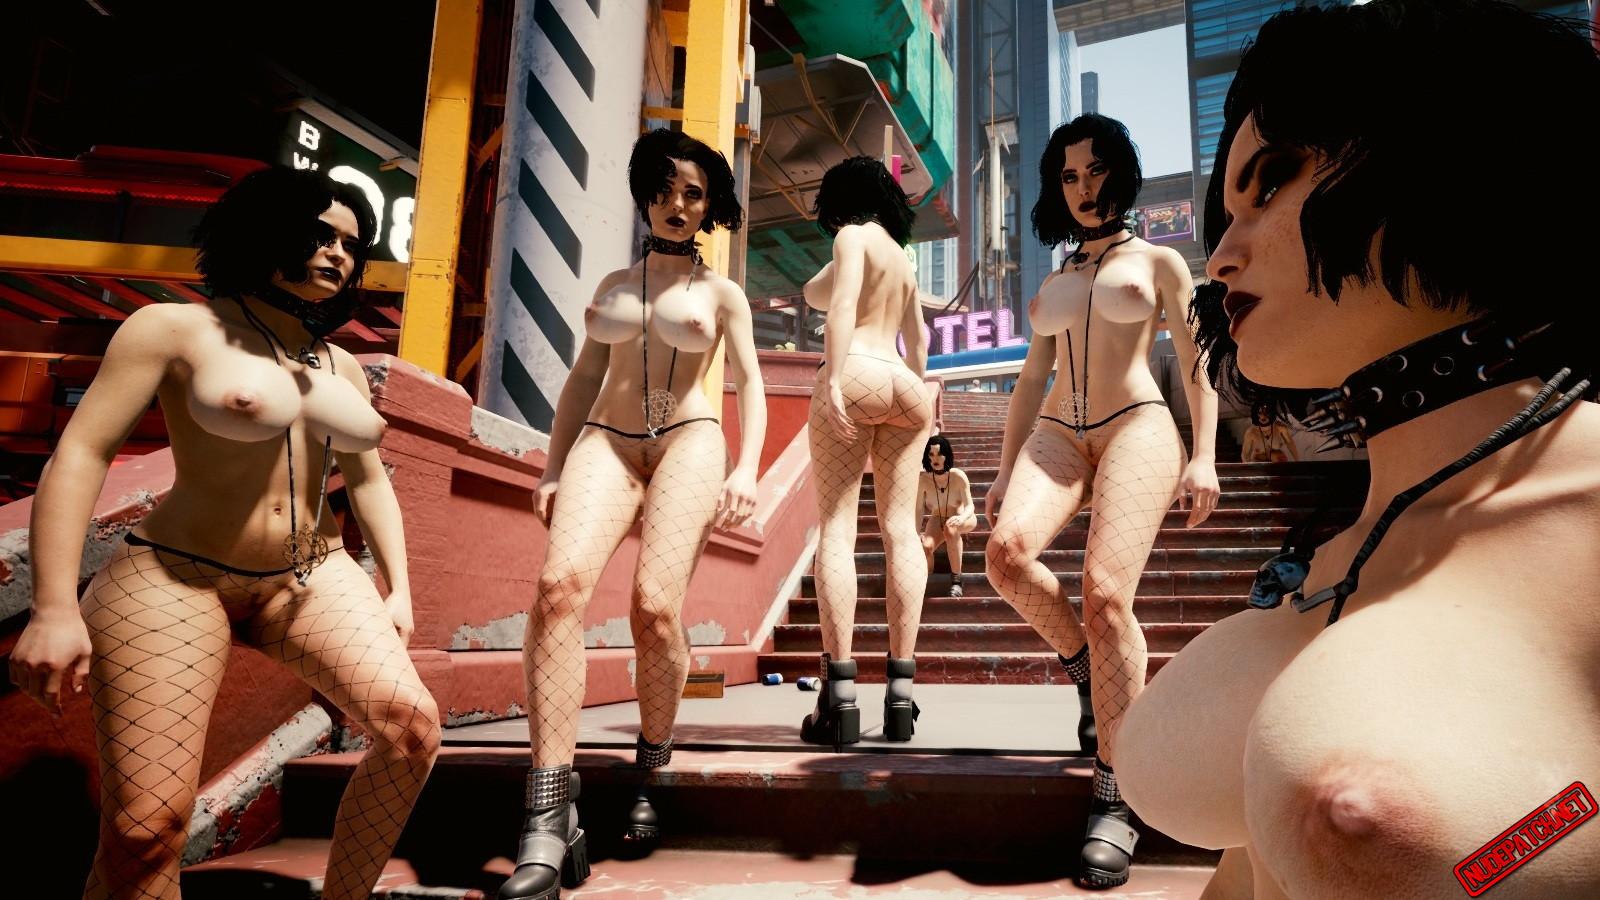 Cyberpunk 2077 Nude Skins